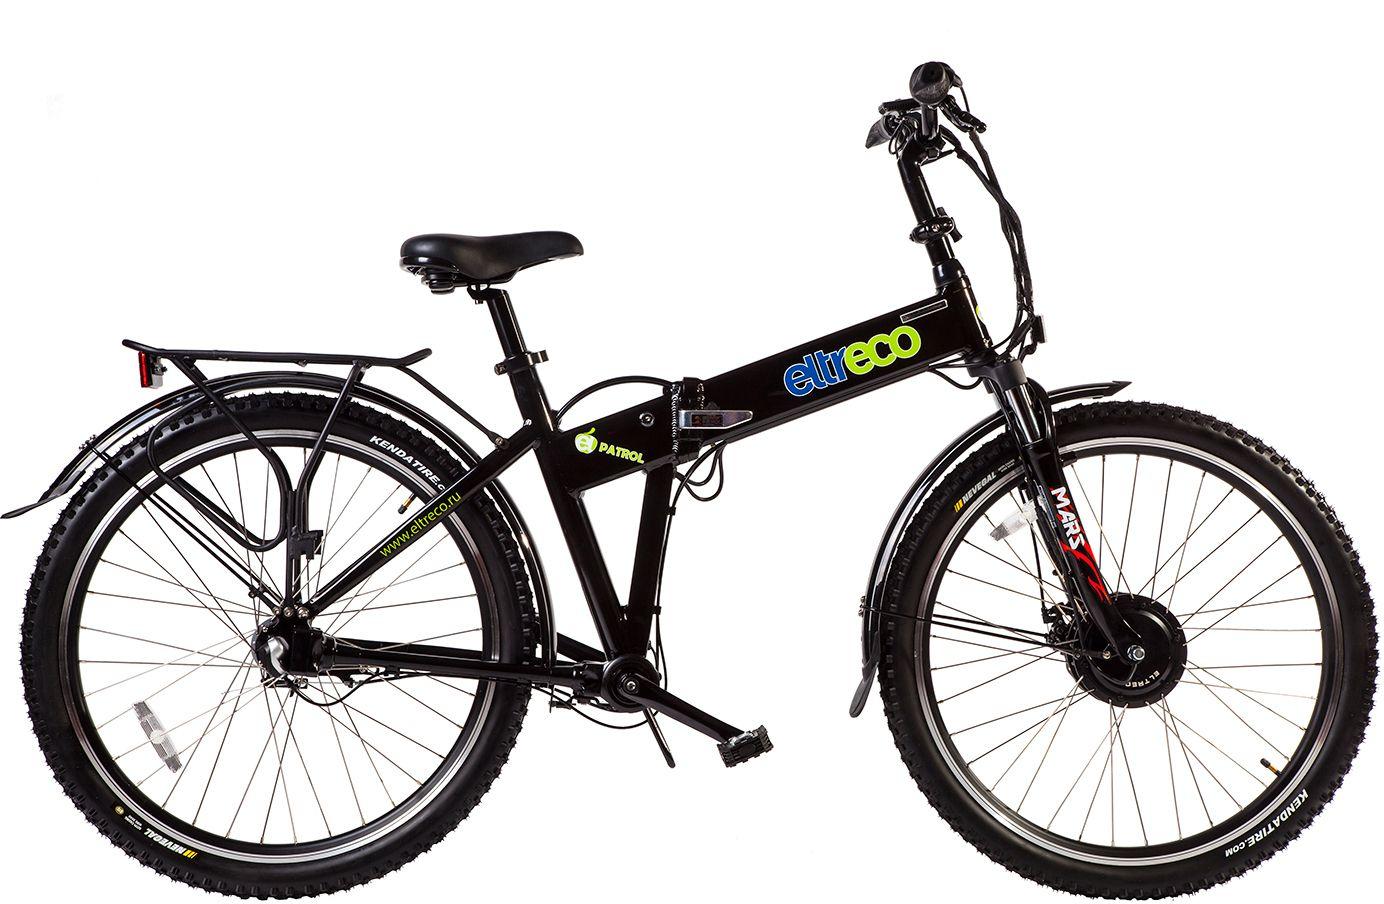 Велосипед Eltreco Patrol Кардан 26 Nexus 7 2016,  Электро  - артикул:284916